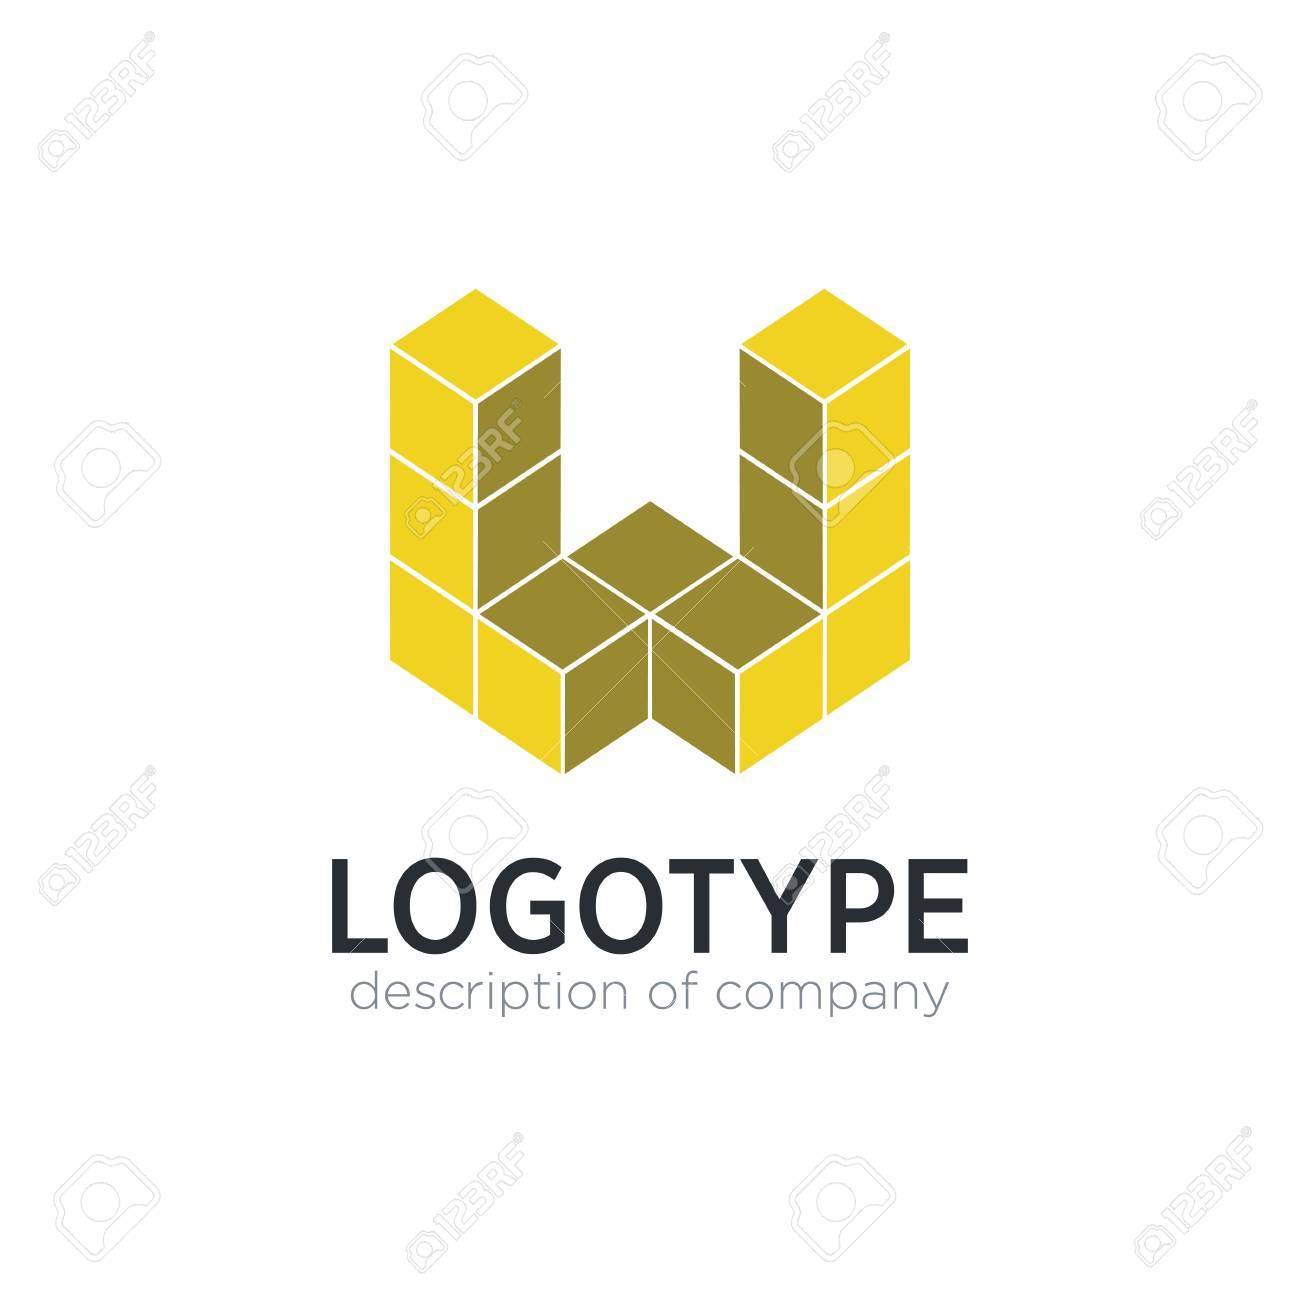 Letter W cube figure logo icon design template elements - 83859819